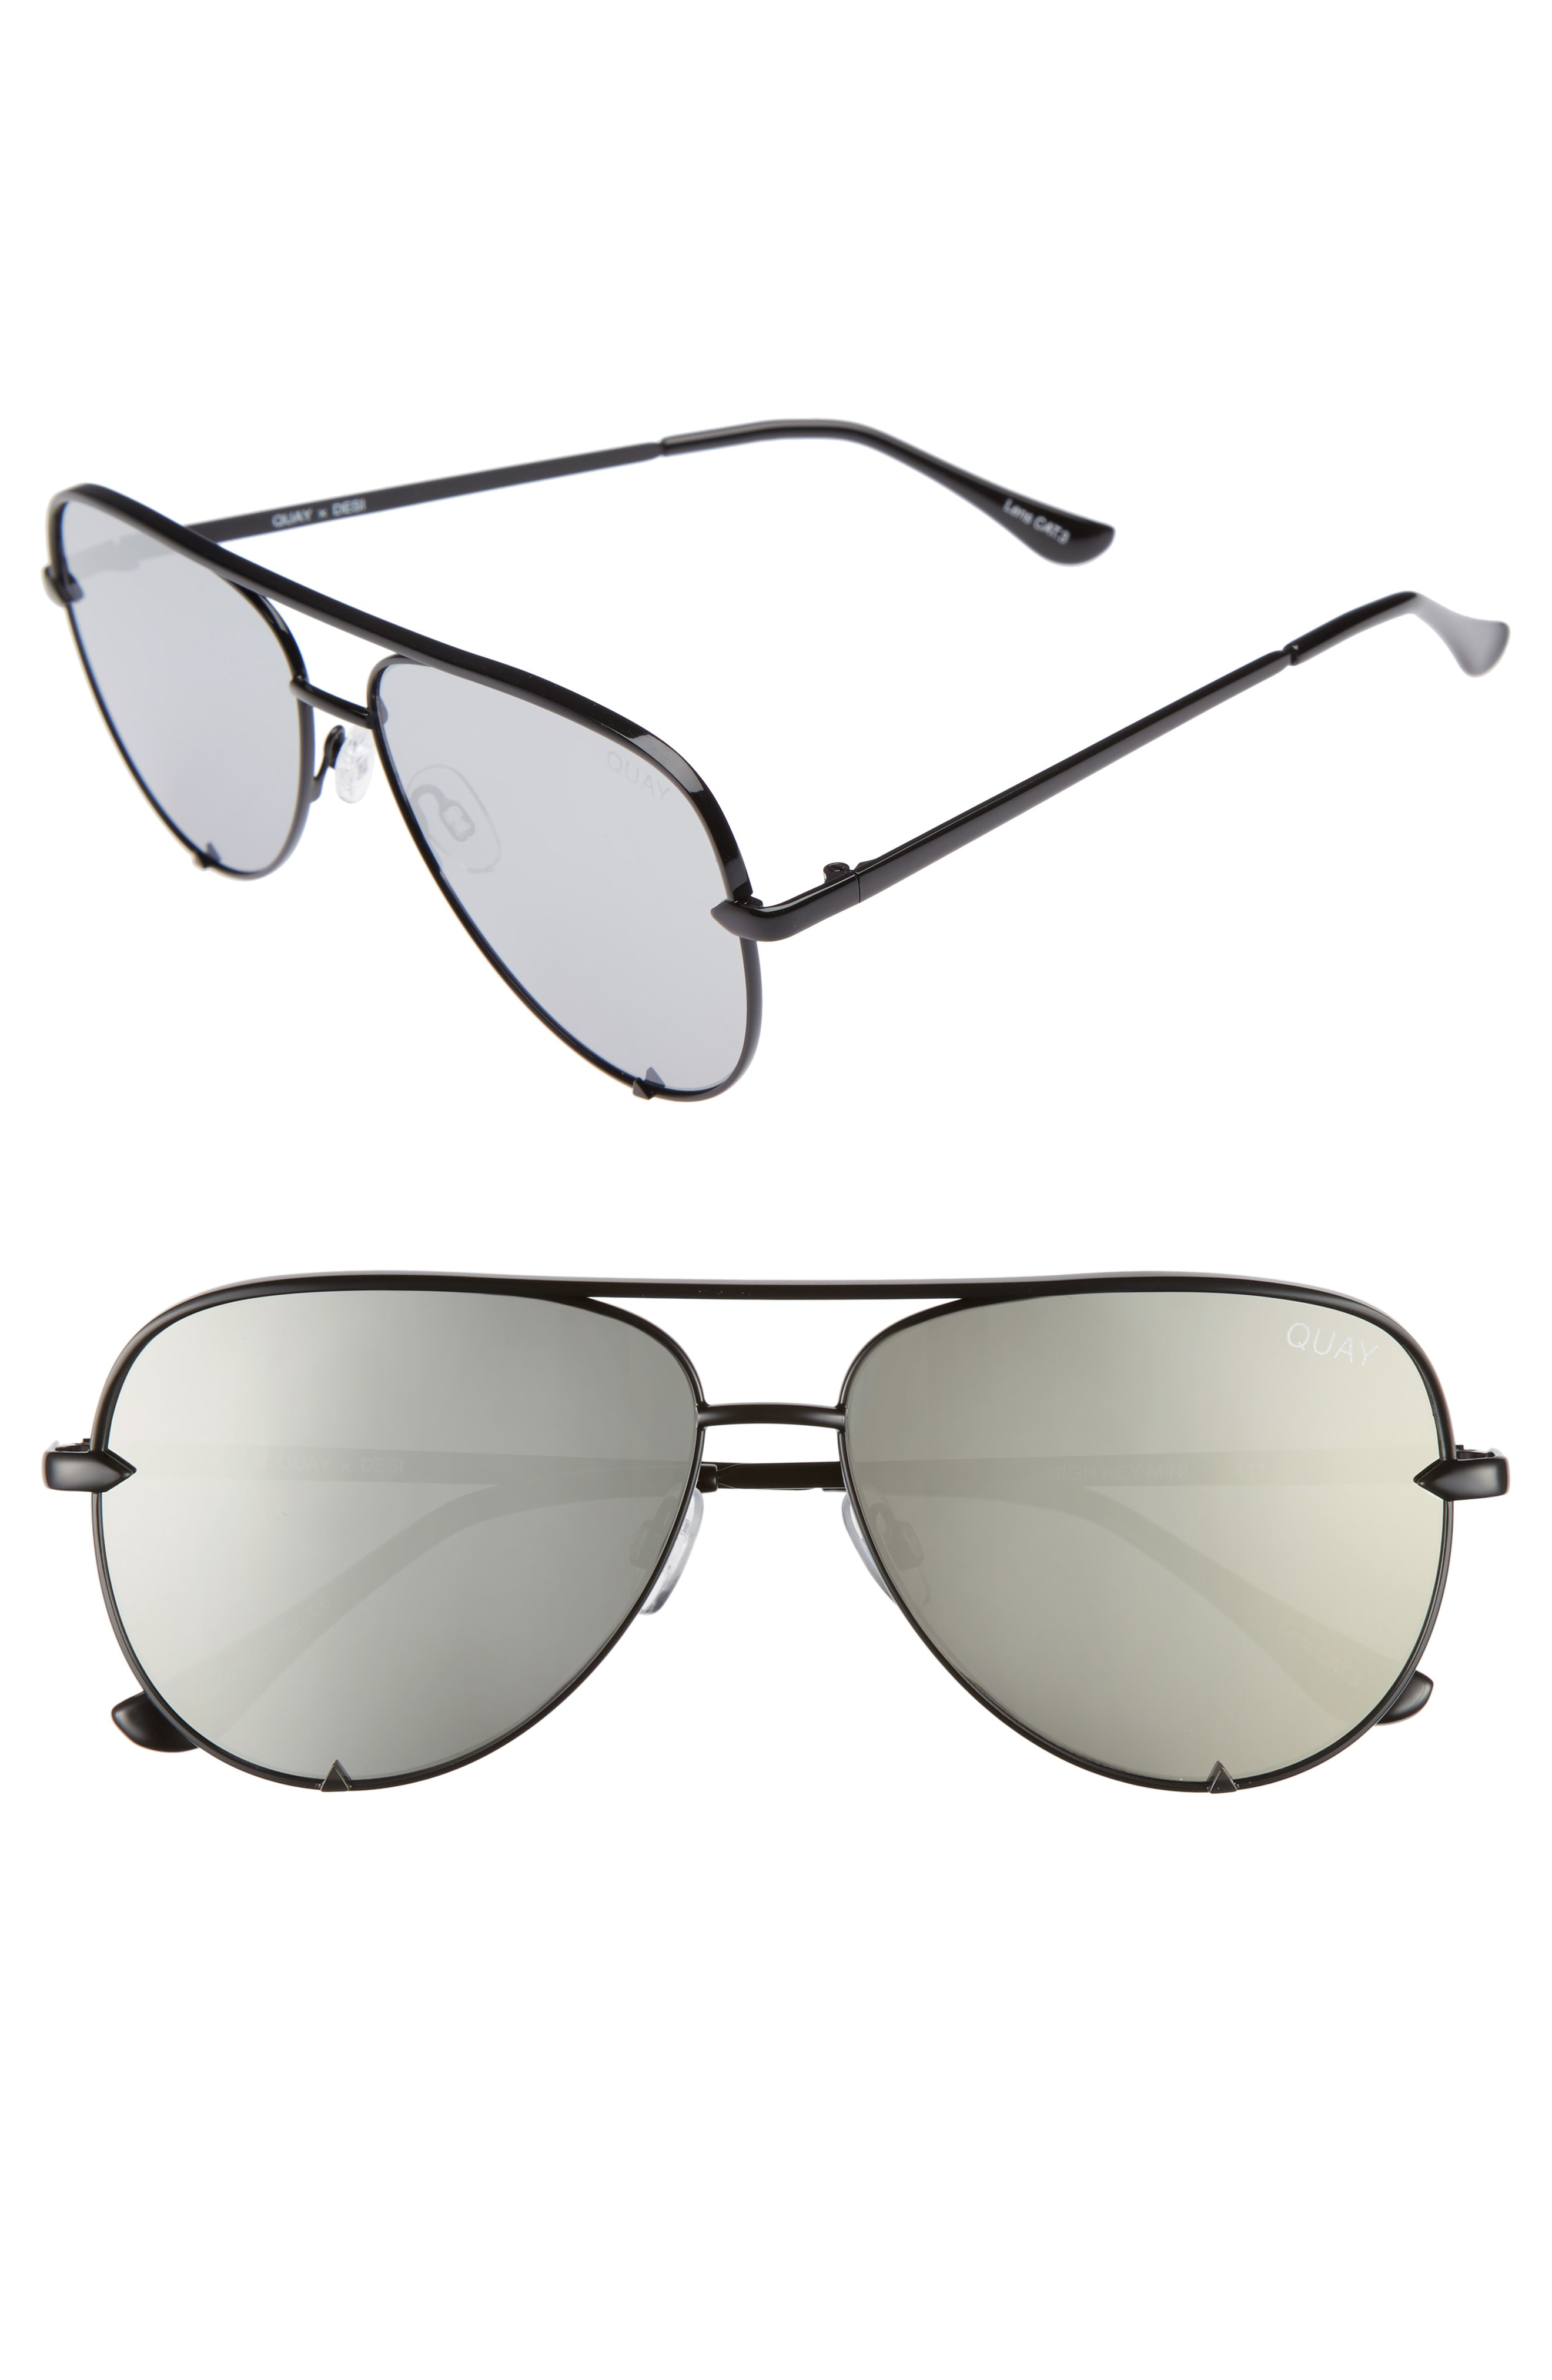 55feacc7047b5 Quay X Desi Perkins High Key Mini 57Mm Aviator Sunglasses - Black  Silver